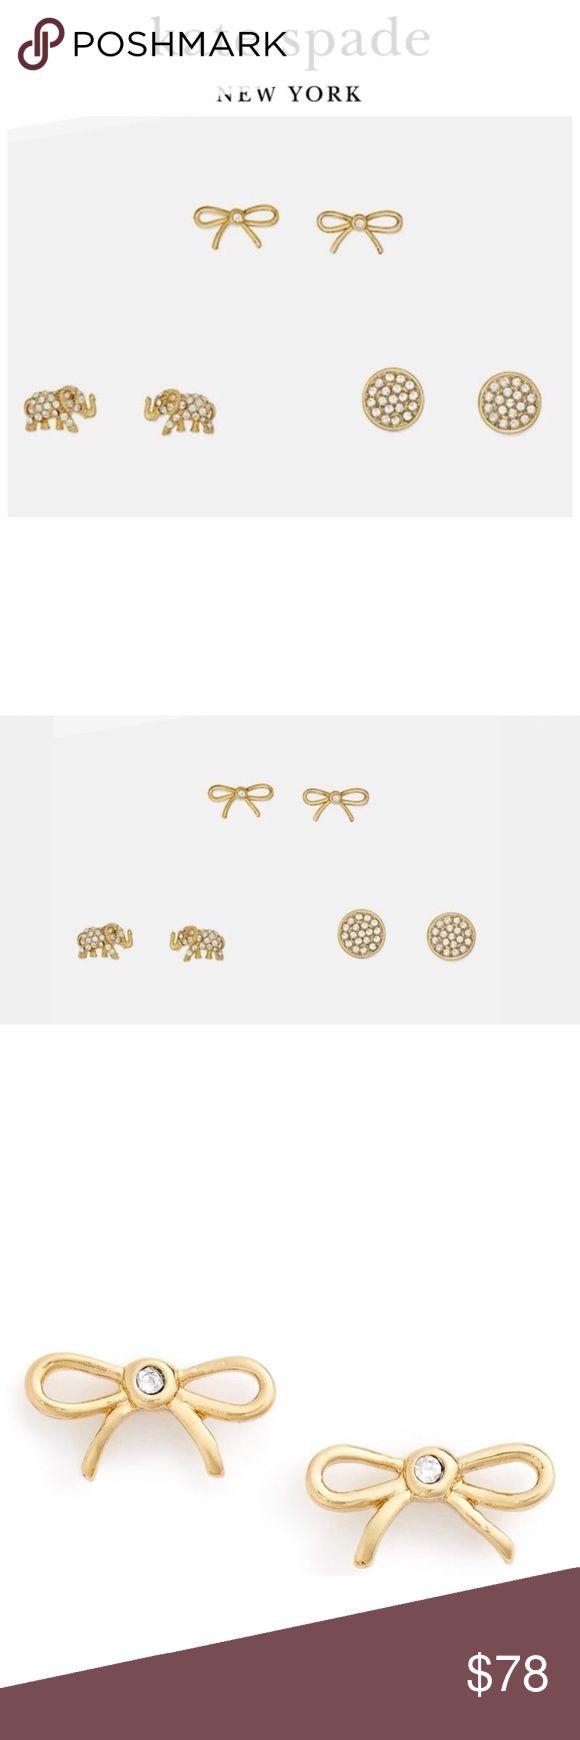 Kate Spade Three's Company Studs NWT. Set of 3. Gold. kate spade Jewelry Earrings